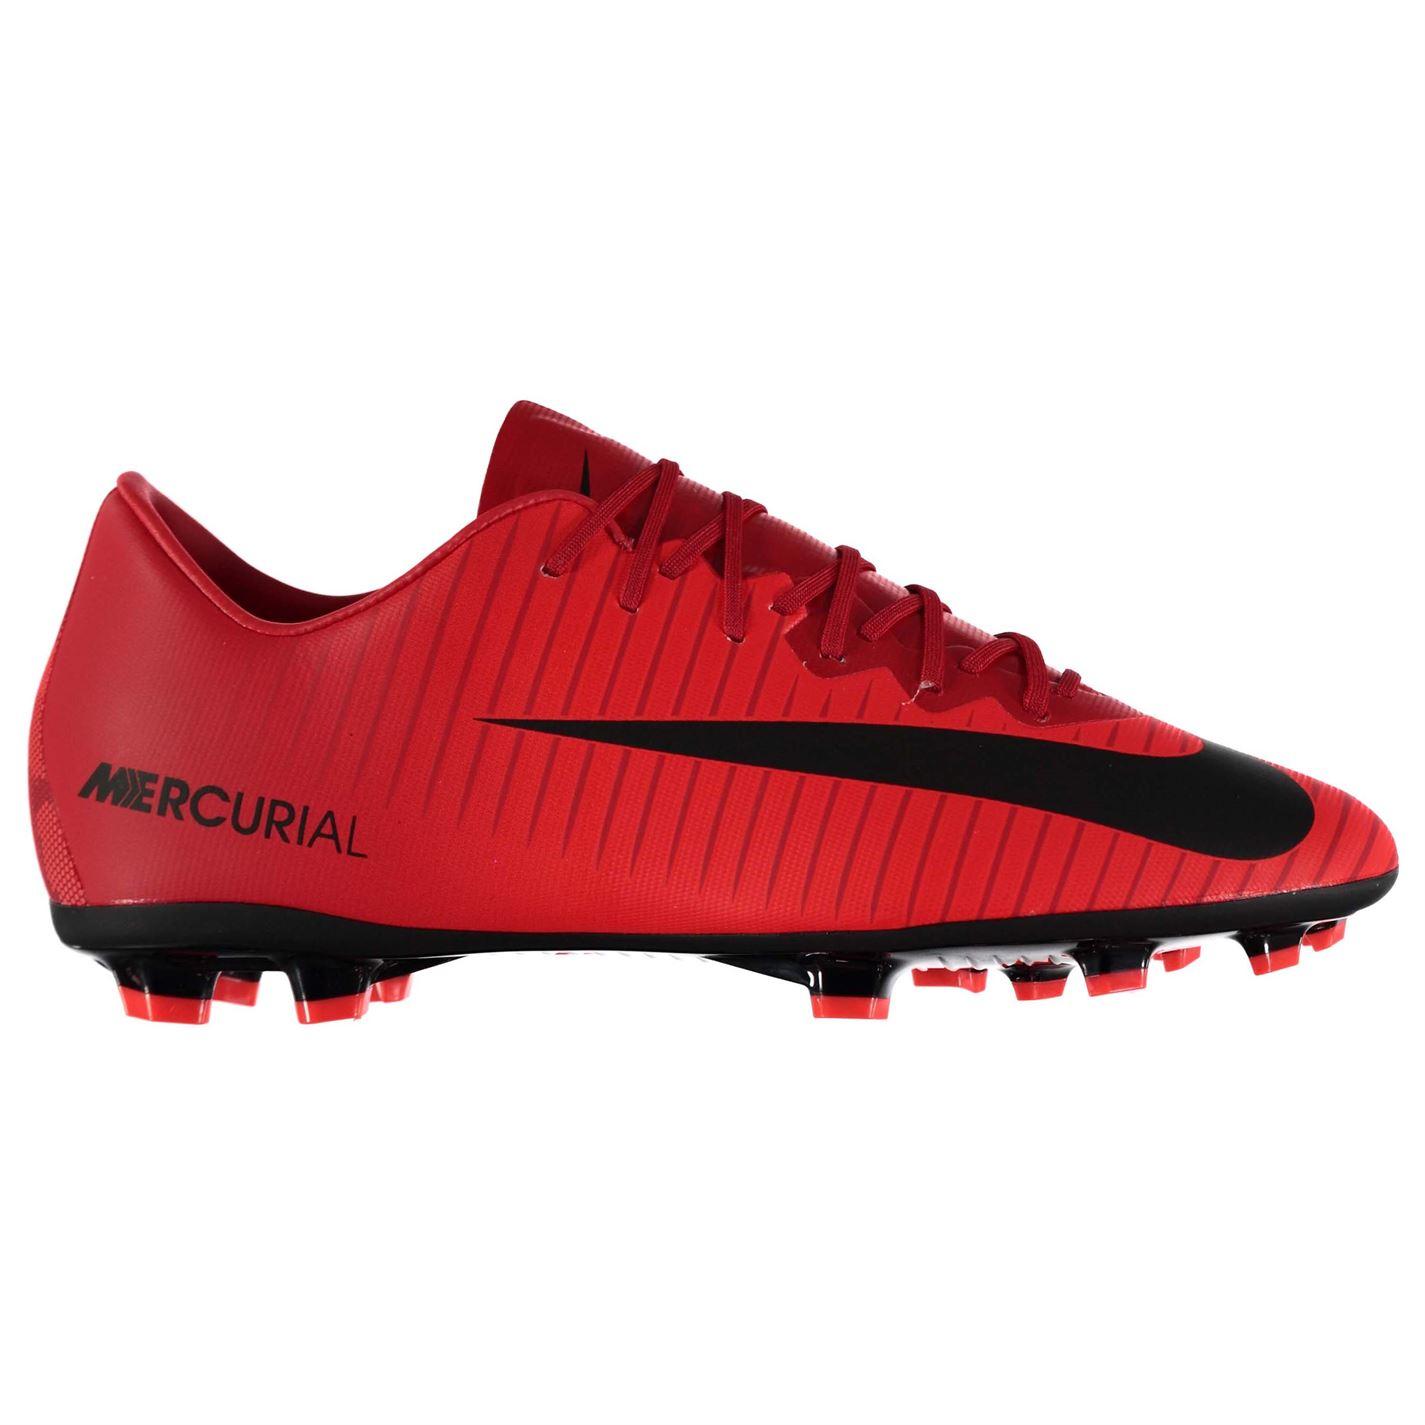 Nike Mercurial Vapor Junior FG Football Boots